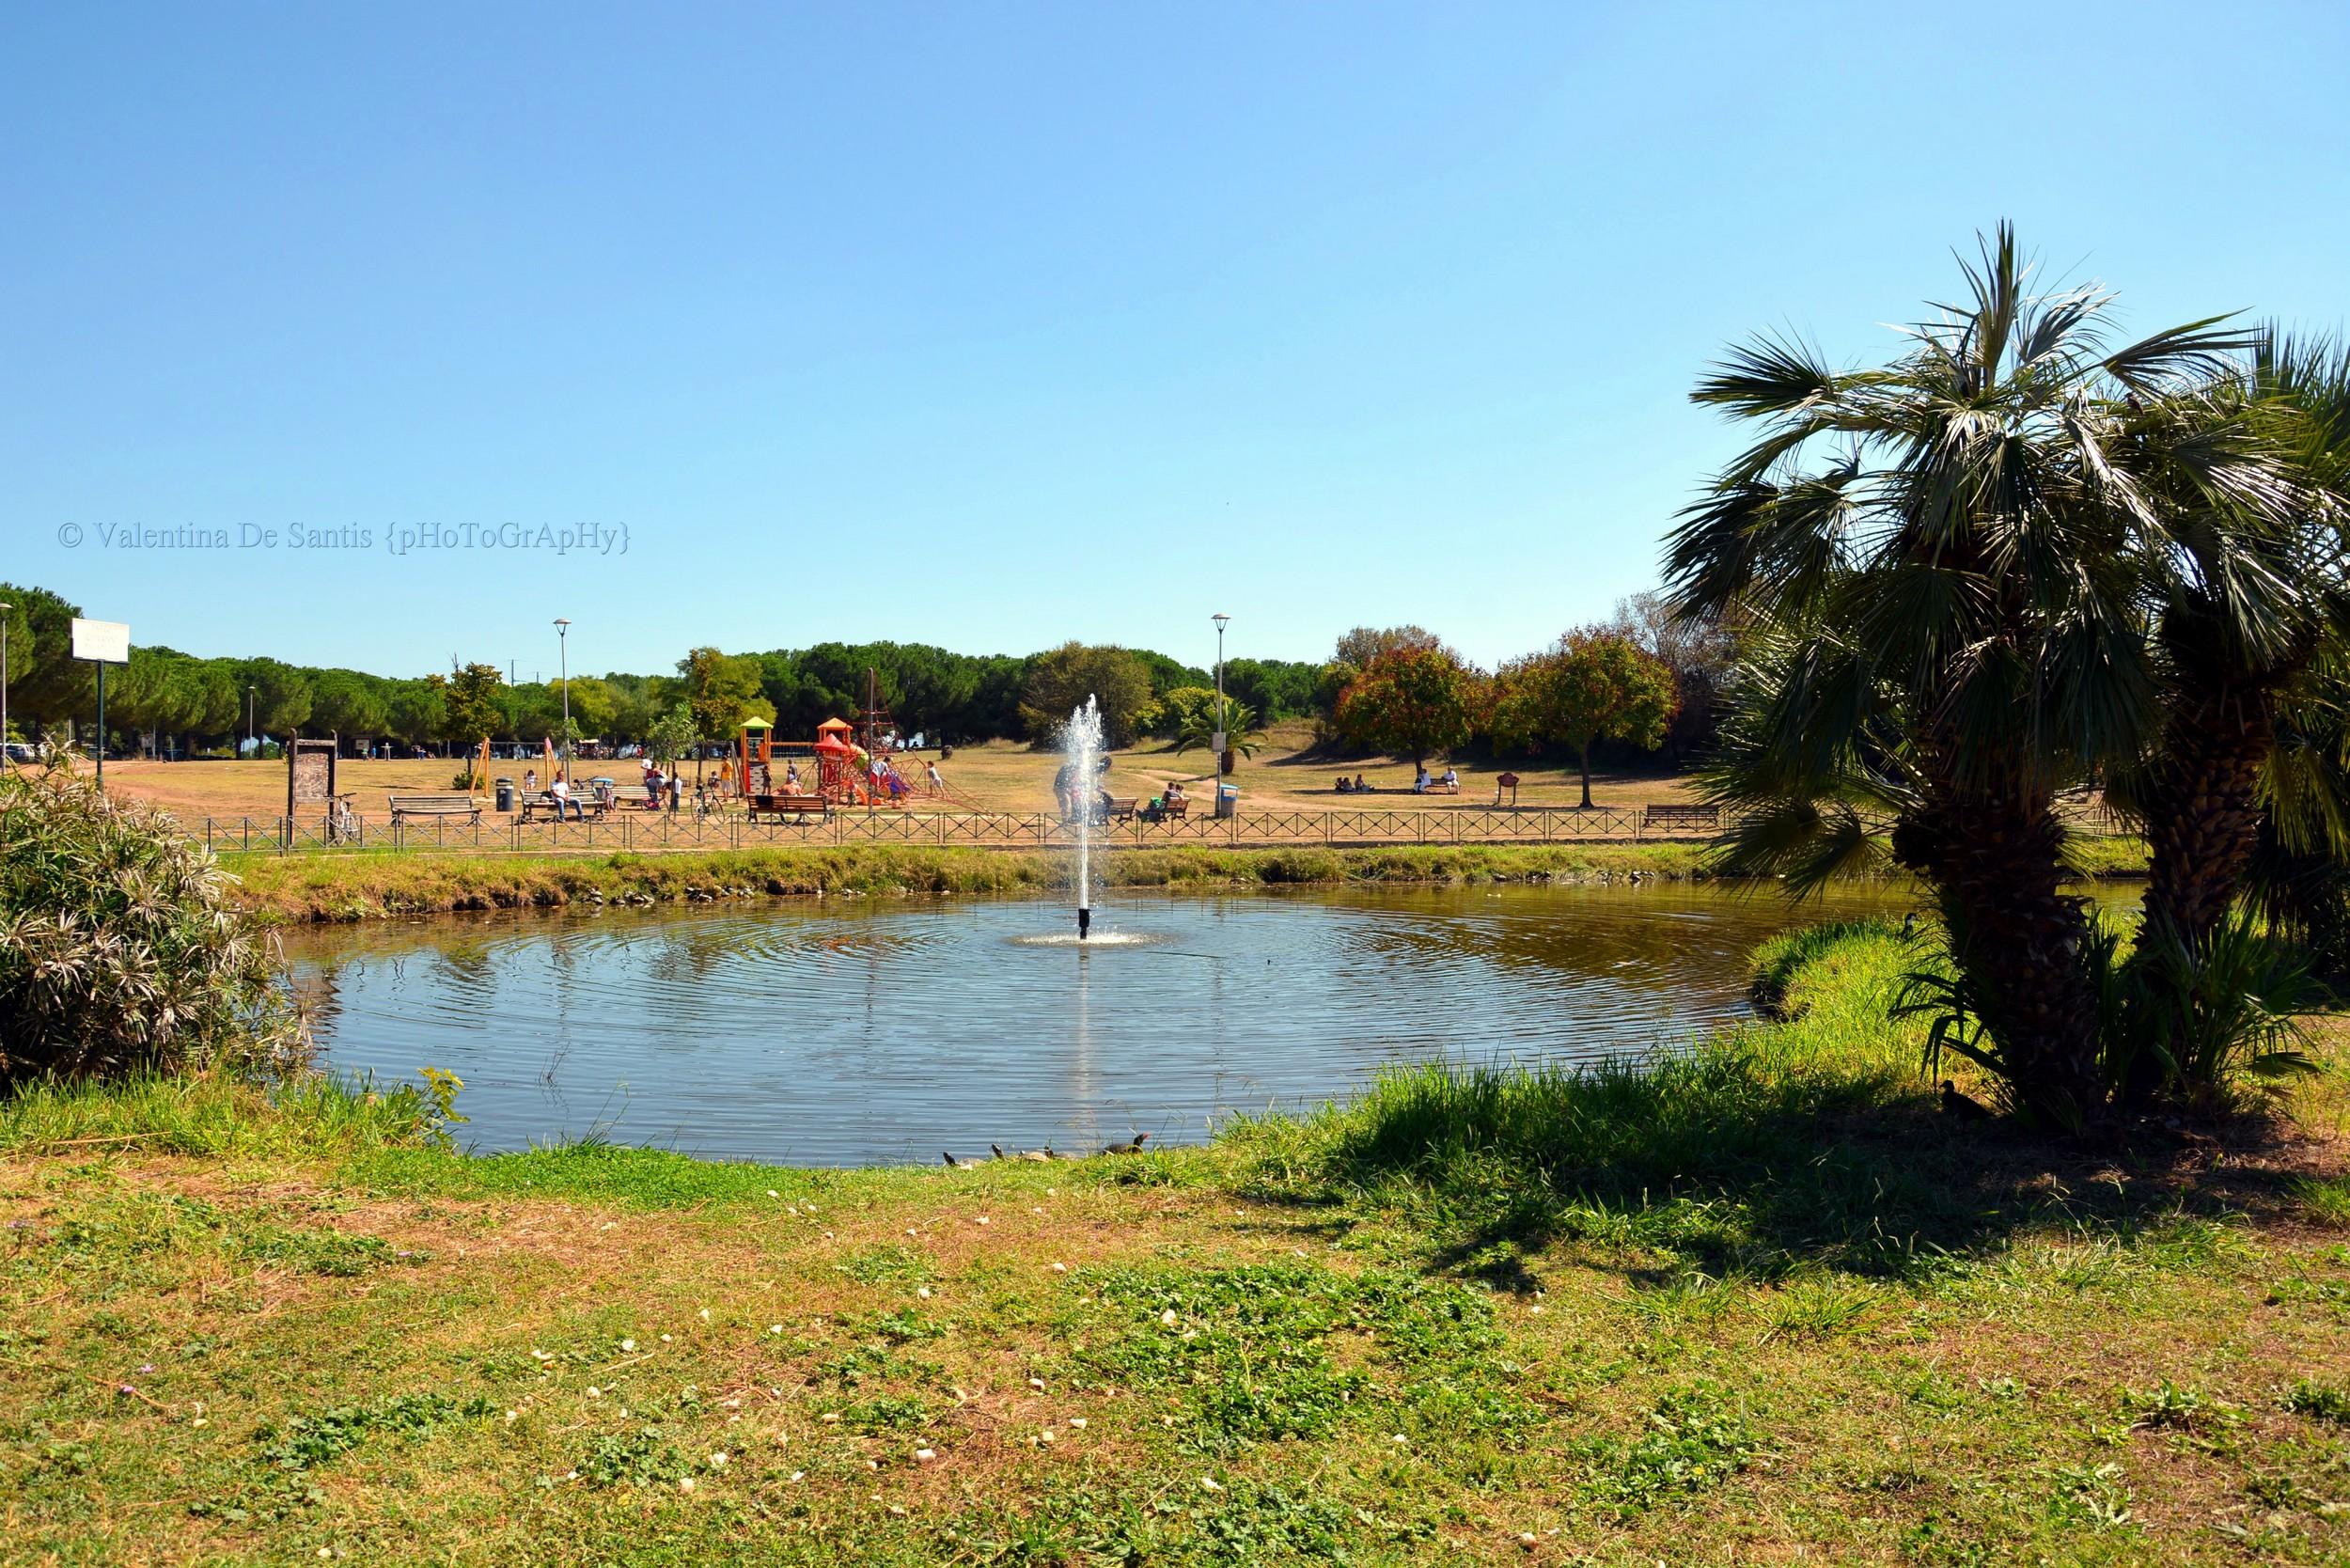 Parks in Rome, Tor Tre Teste